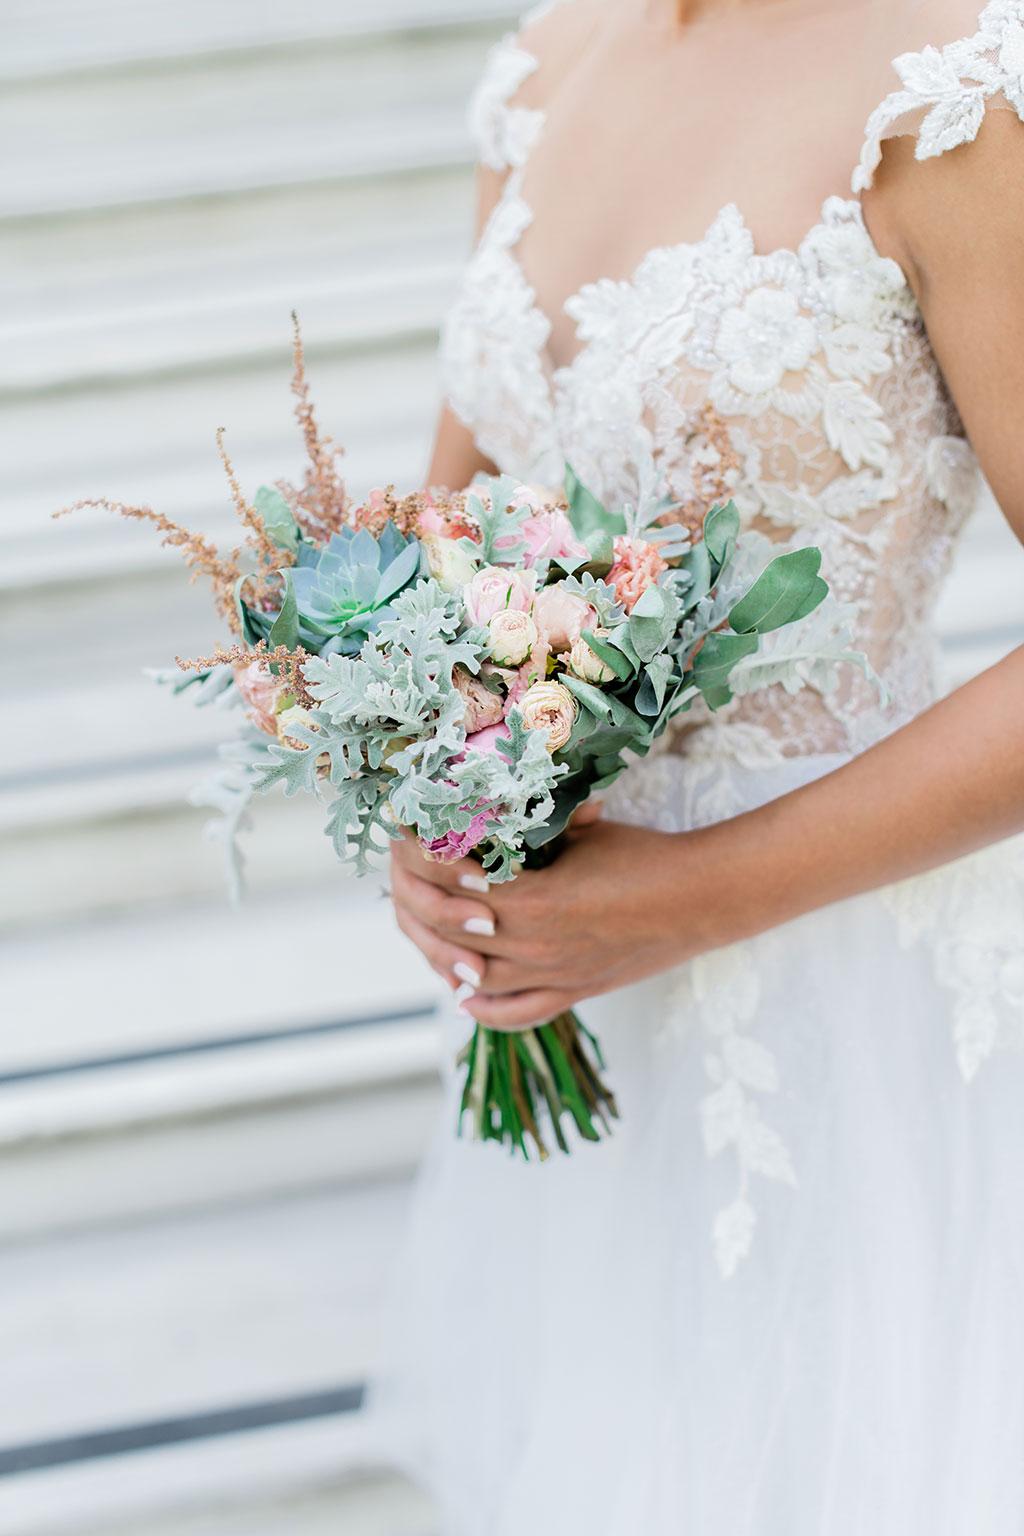 a beautiful bridal bouquet, μια όμορφη νυφική ανθοδέσμη